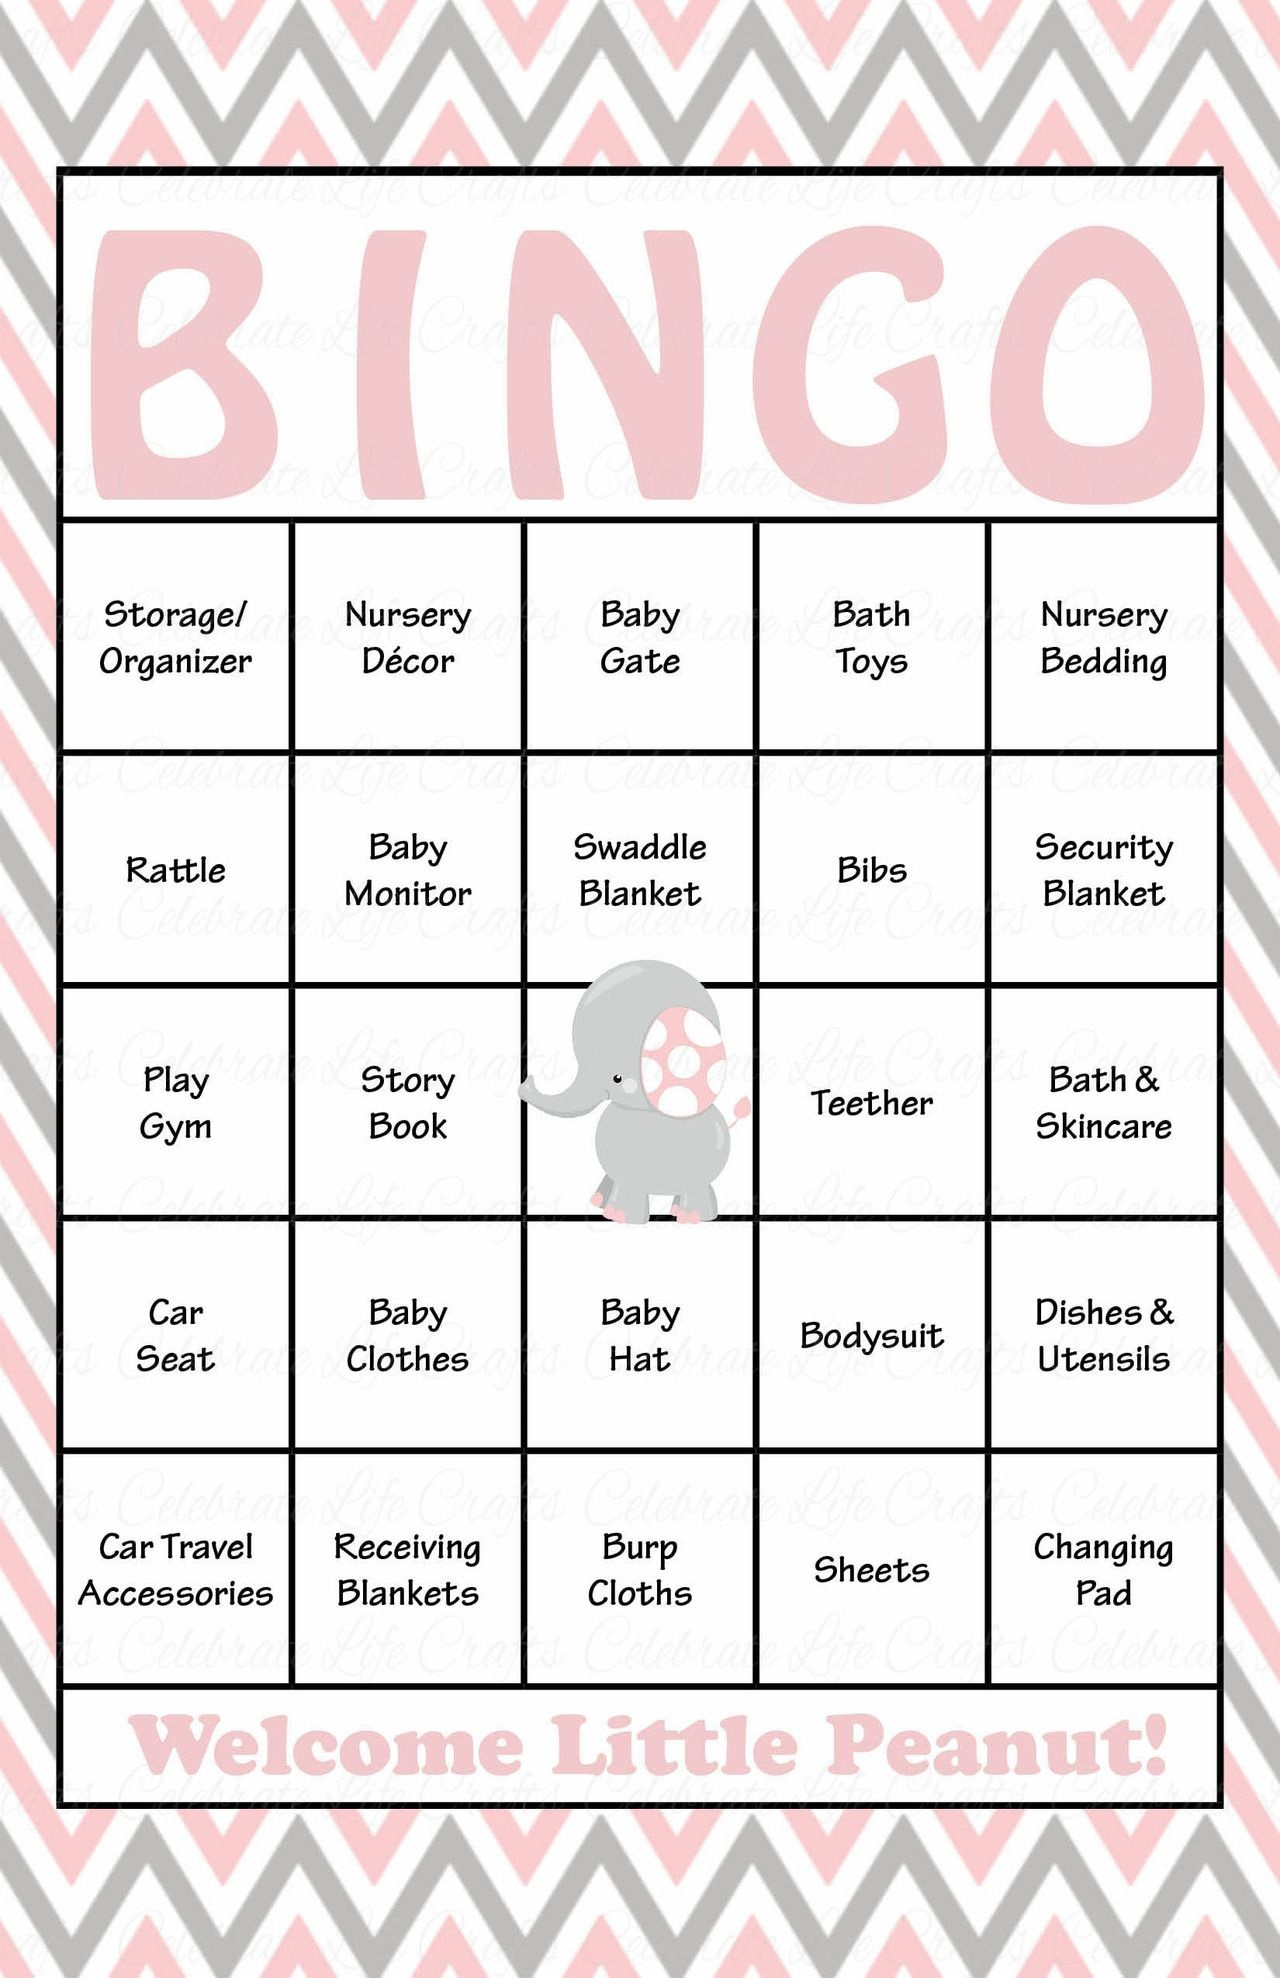 Elephant Baby Shower - Baby Bingo Cards - Printable Download - Baby - 50 Free Printable Baby Bingo Cards